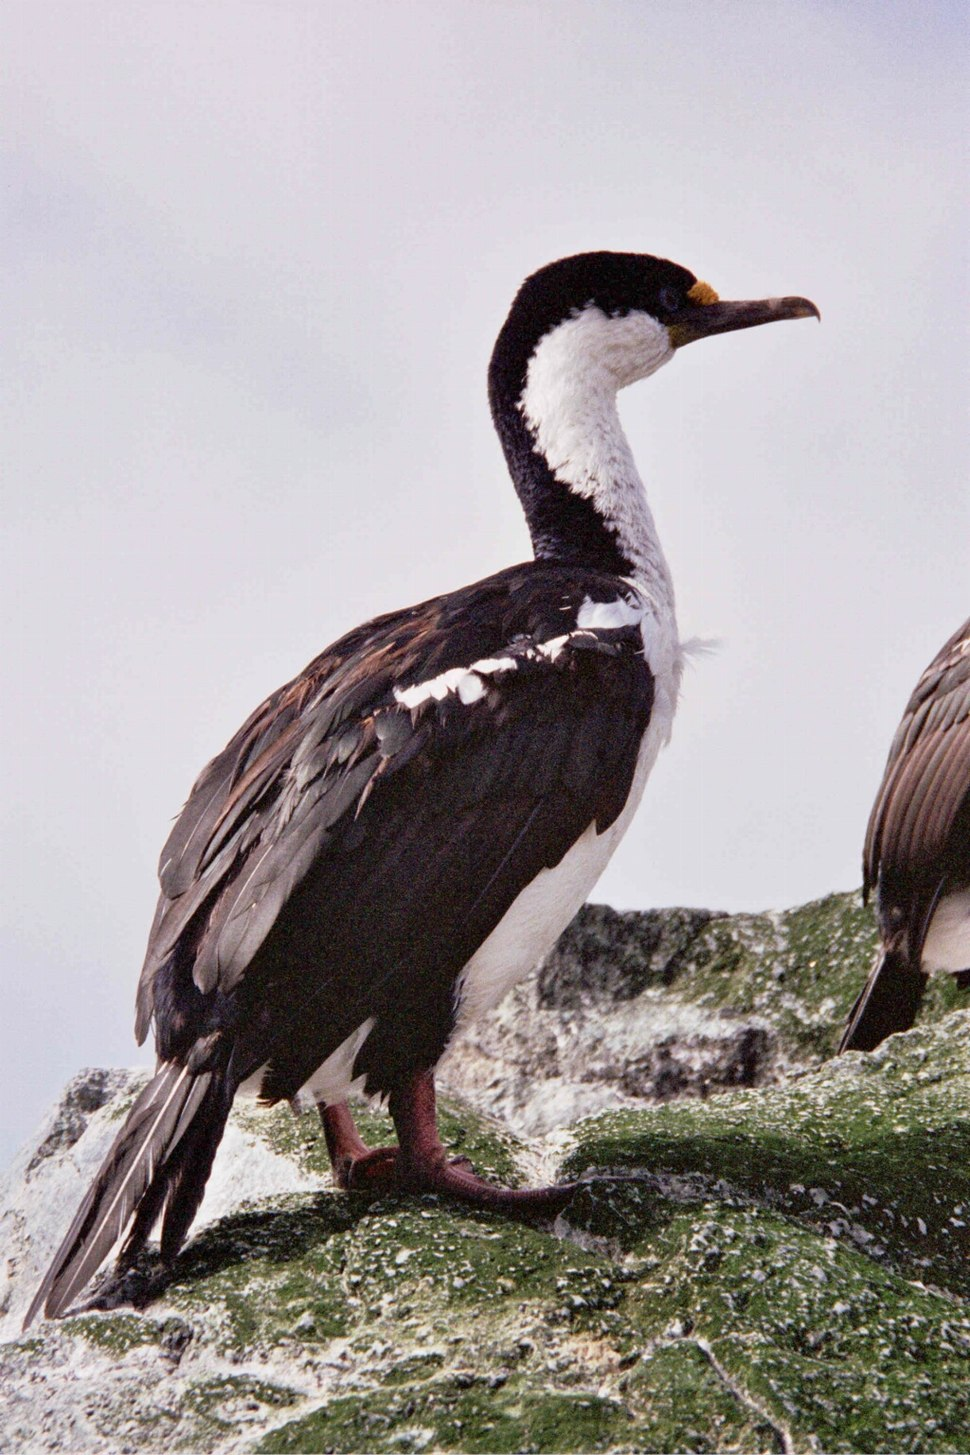 MacquarieIslandCormorant